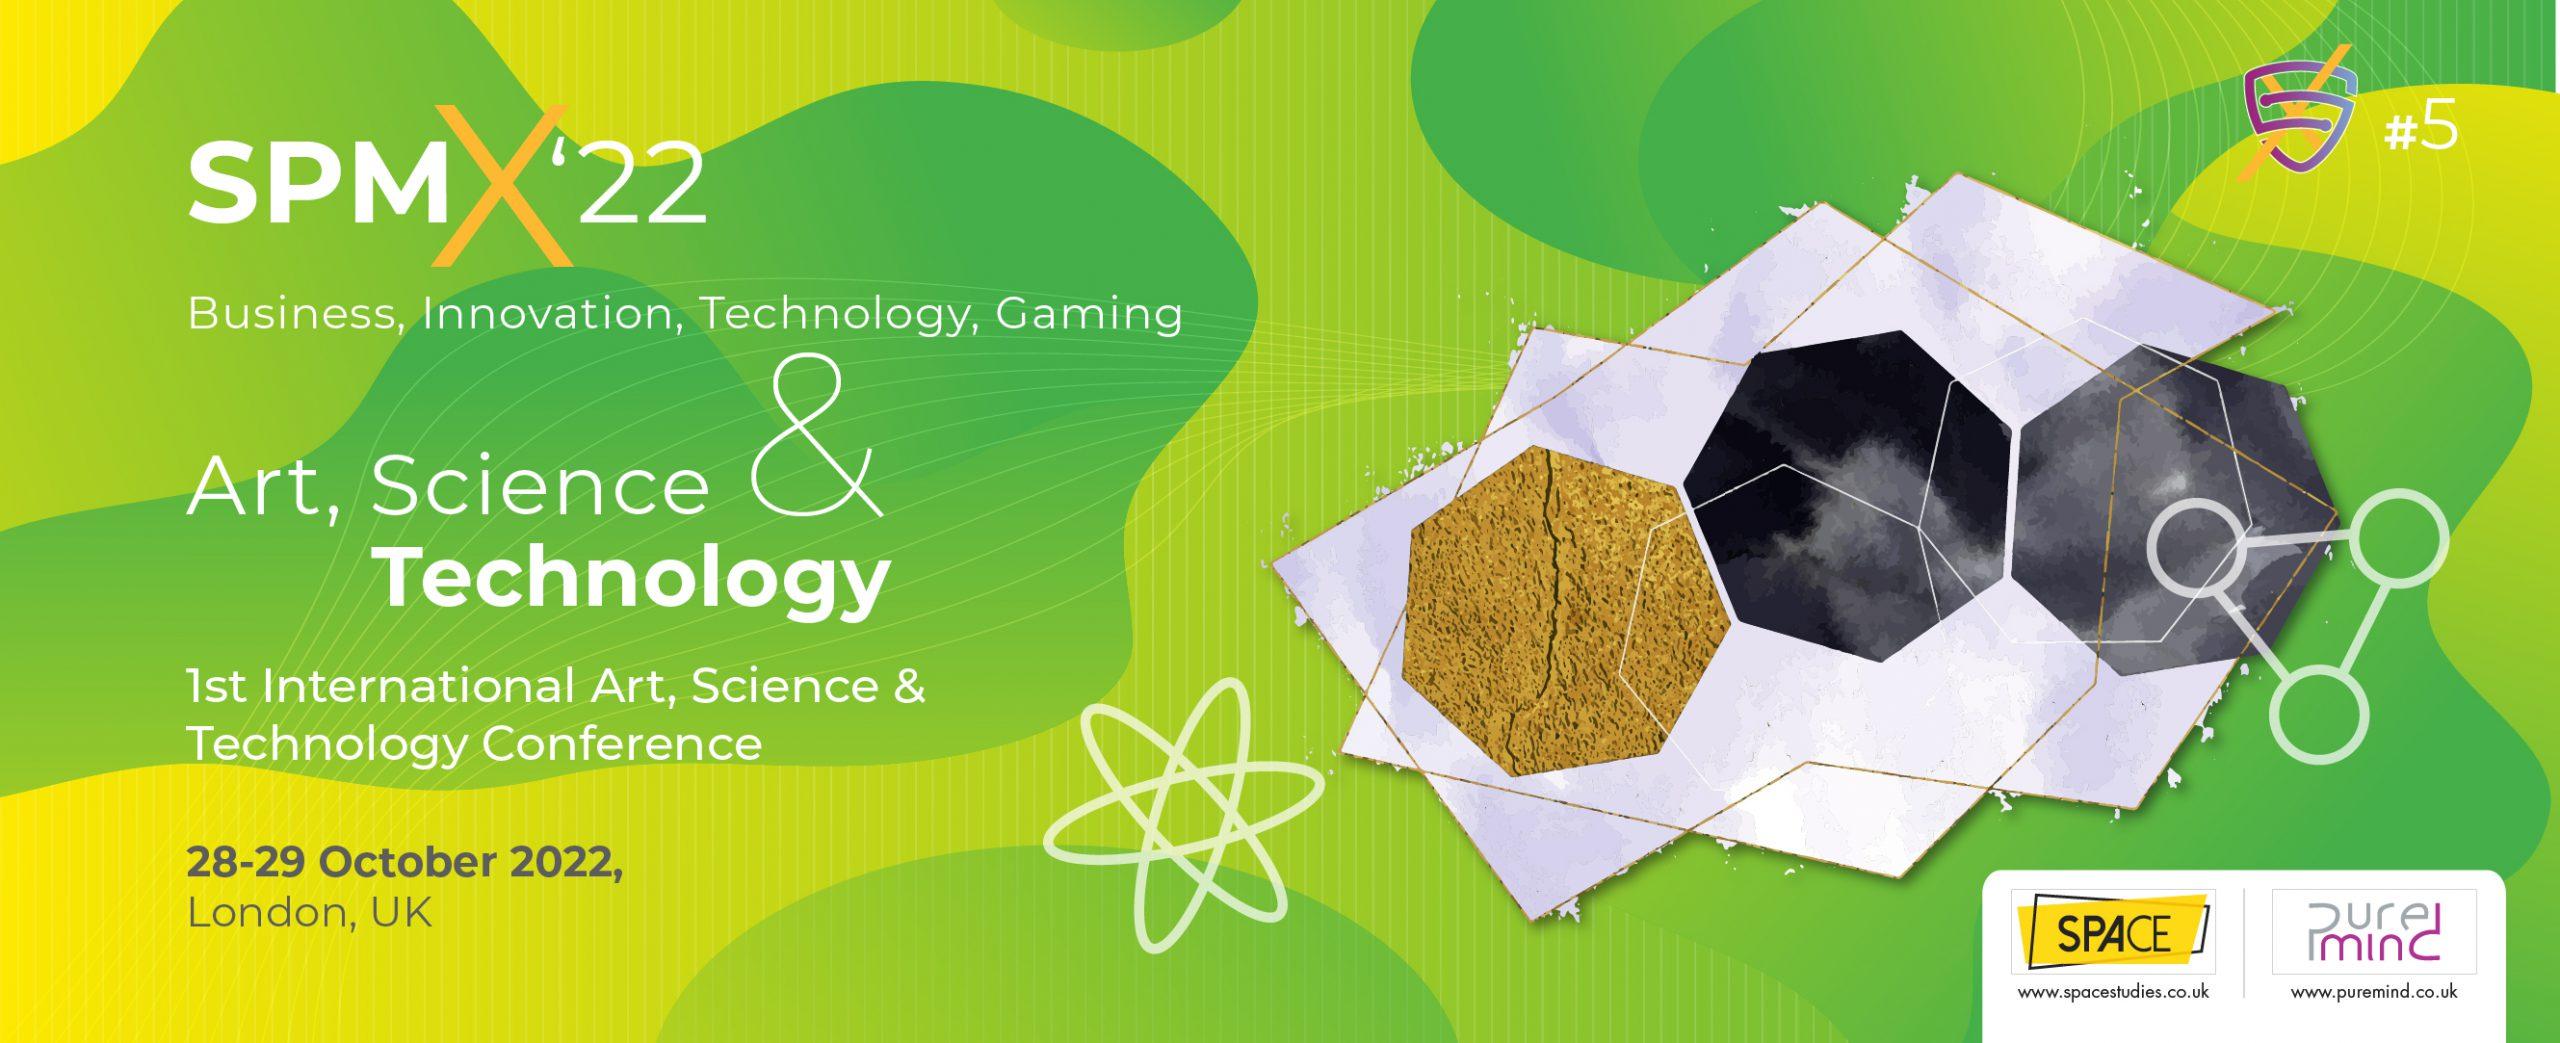 International Arts, Science & Technology Conference